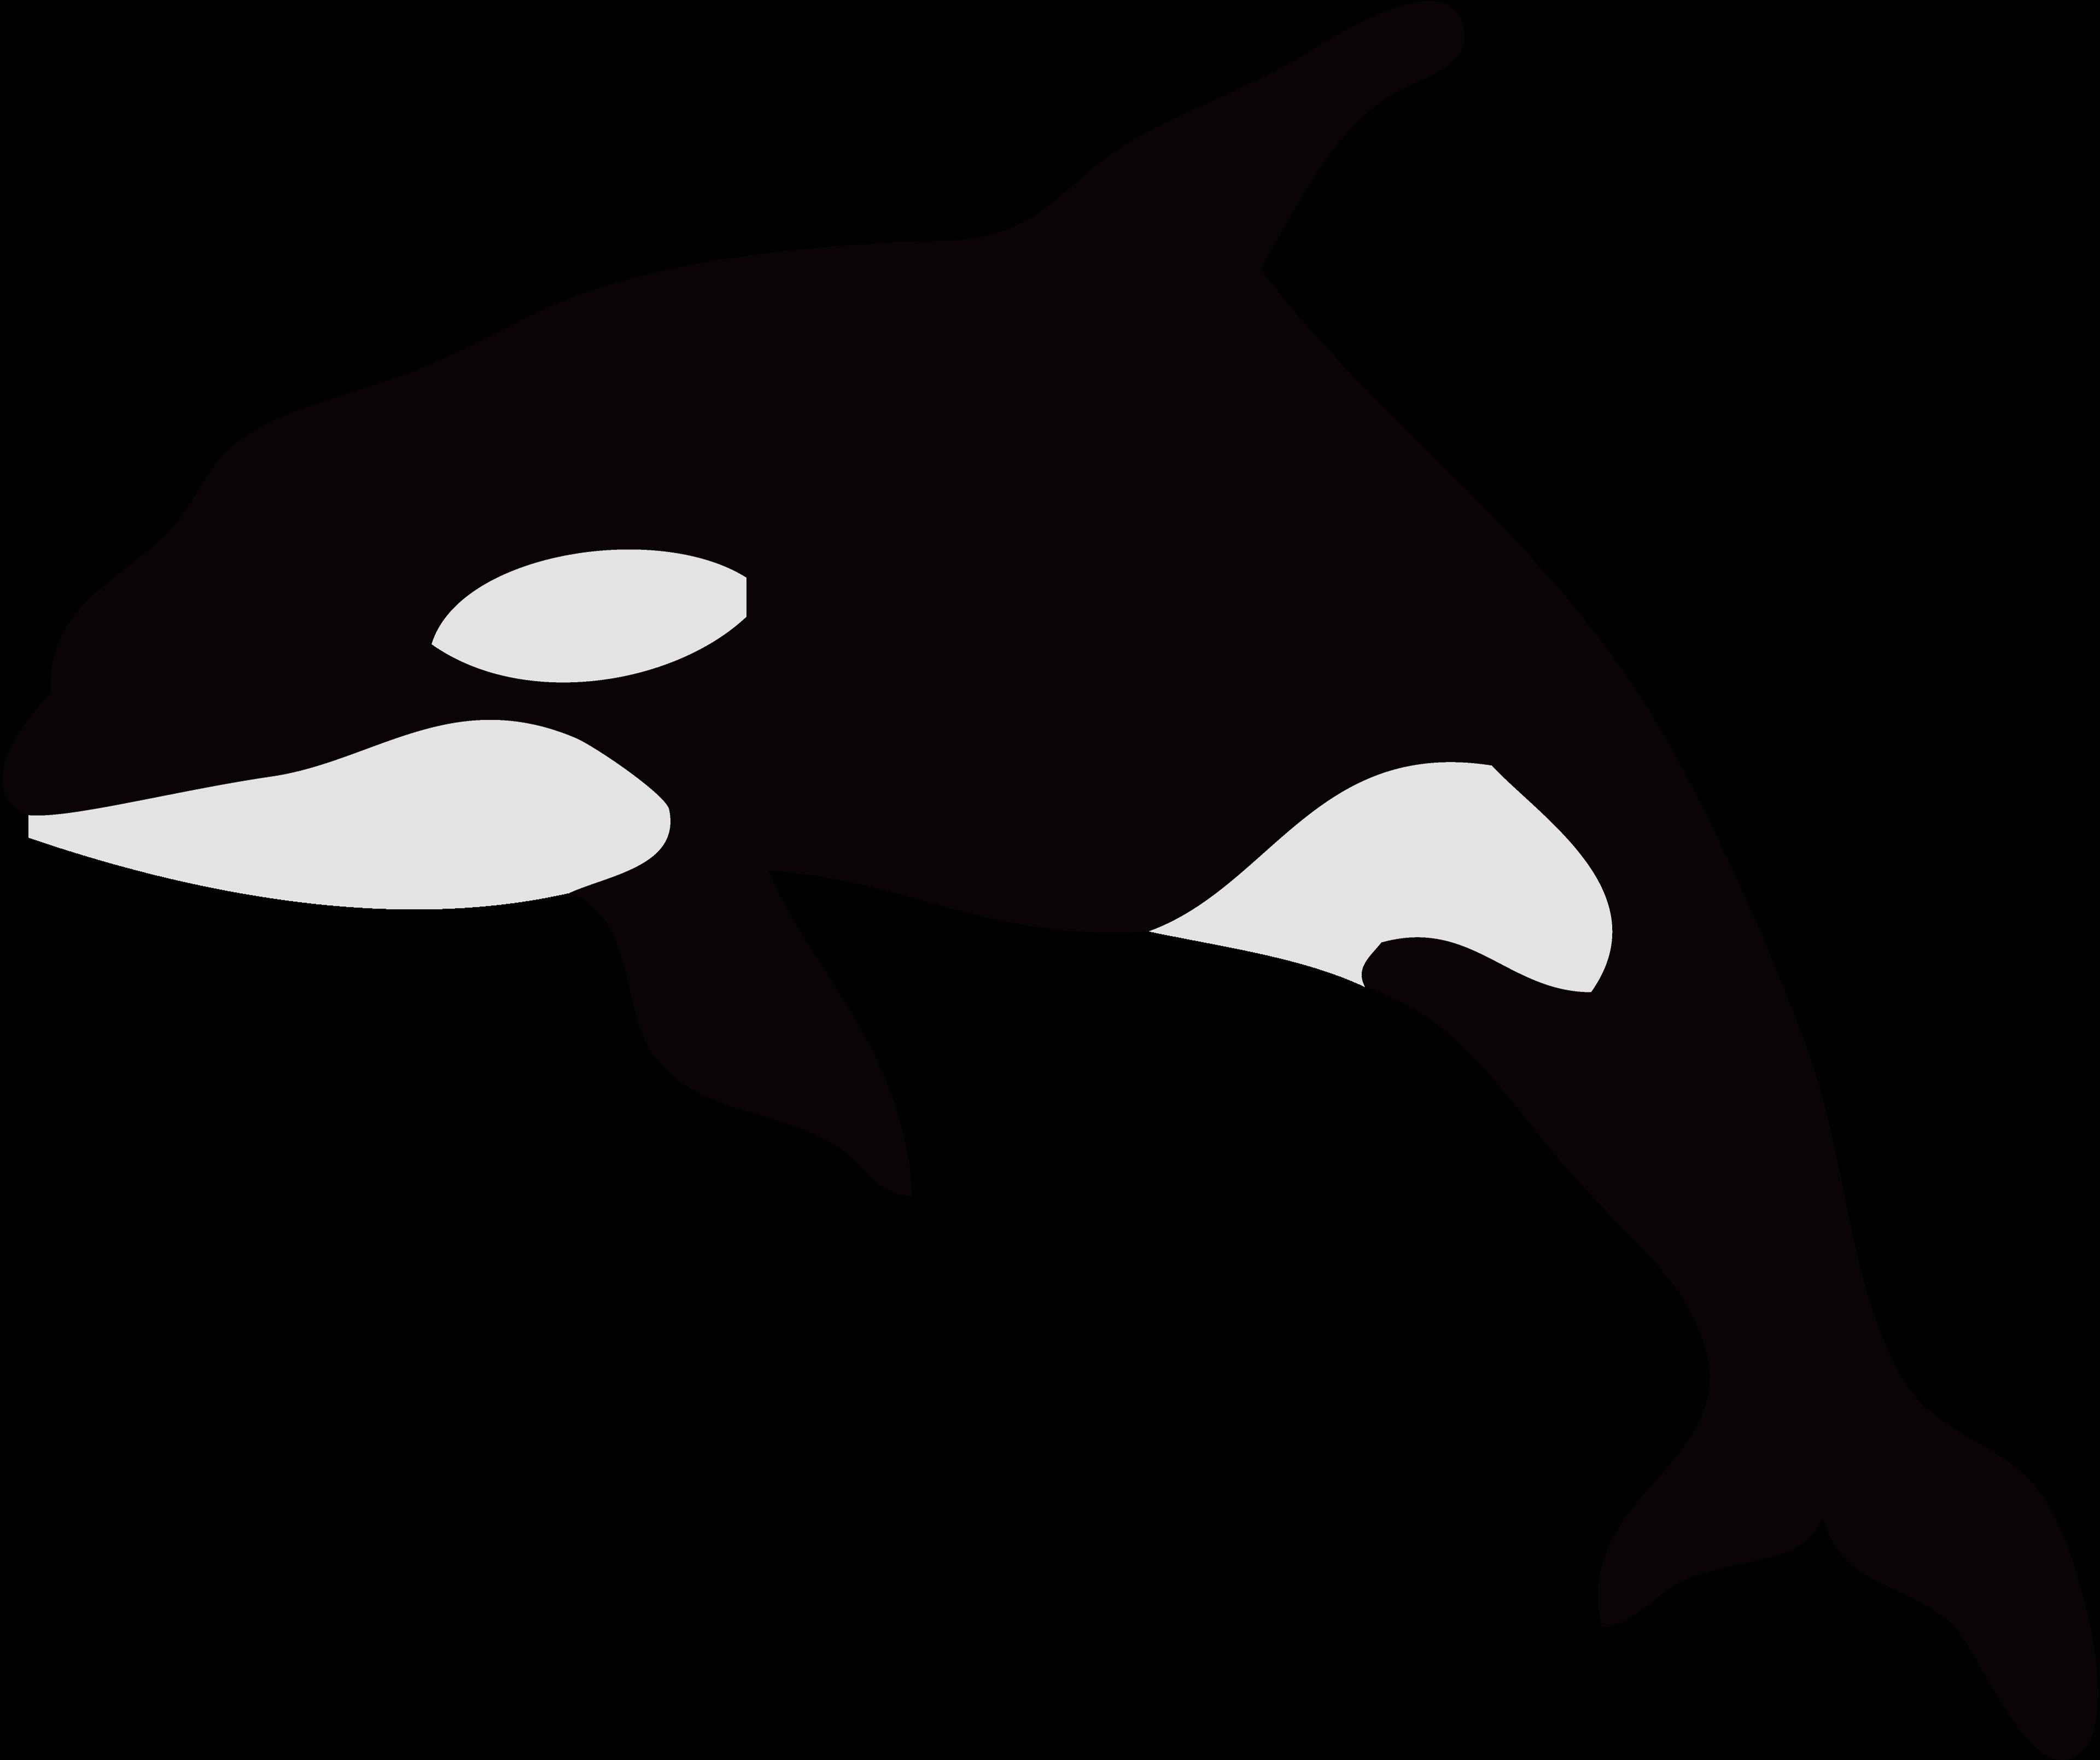 Orca clipart silhouette. Dolphin killer whale illustration